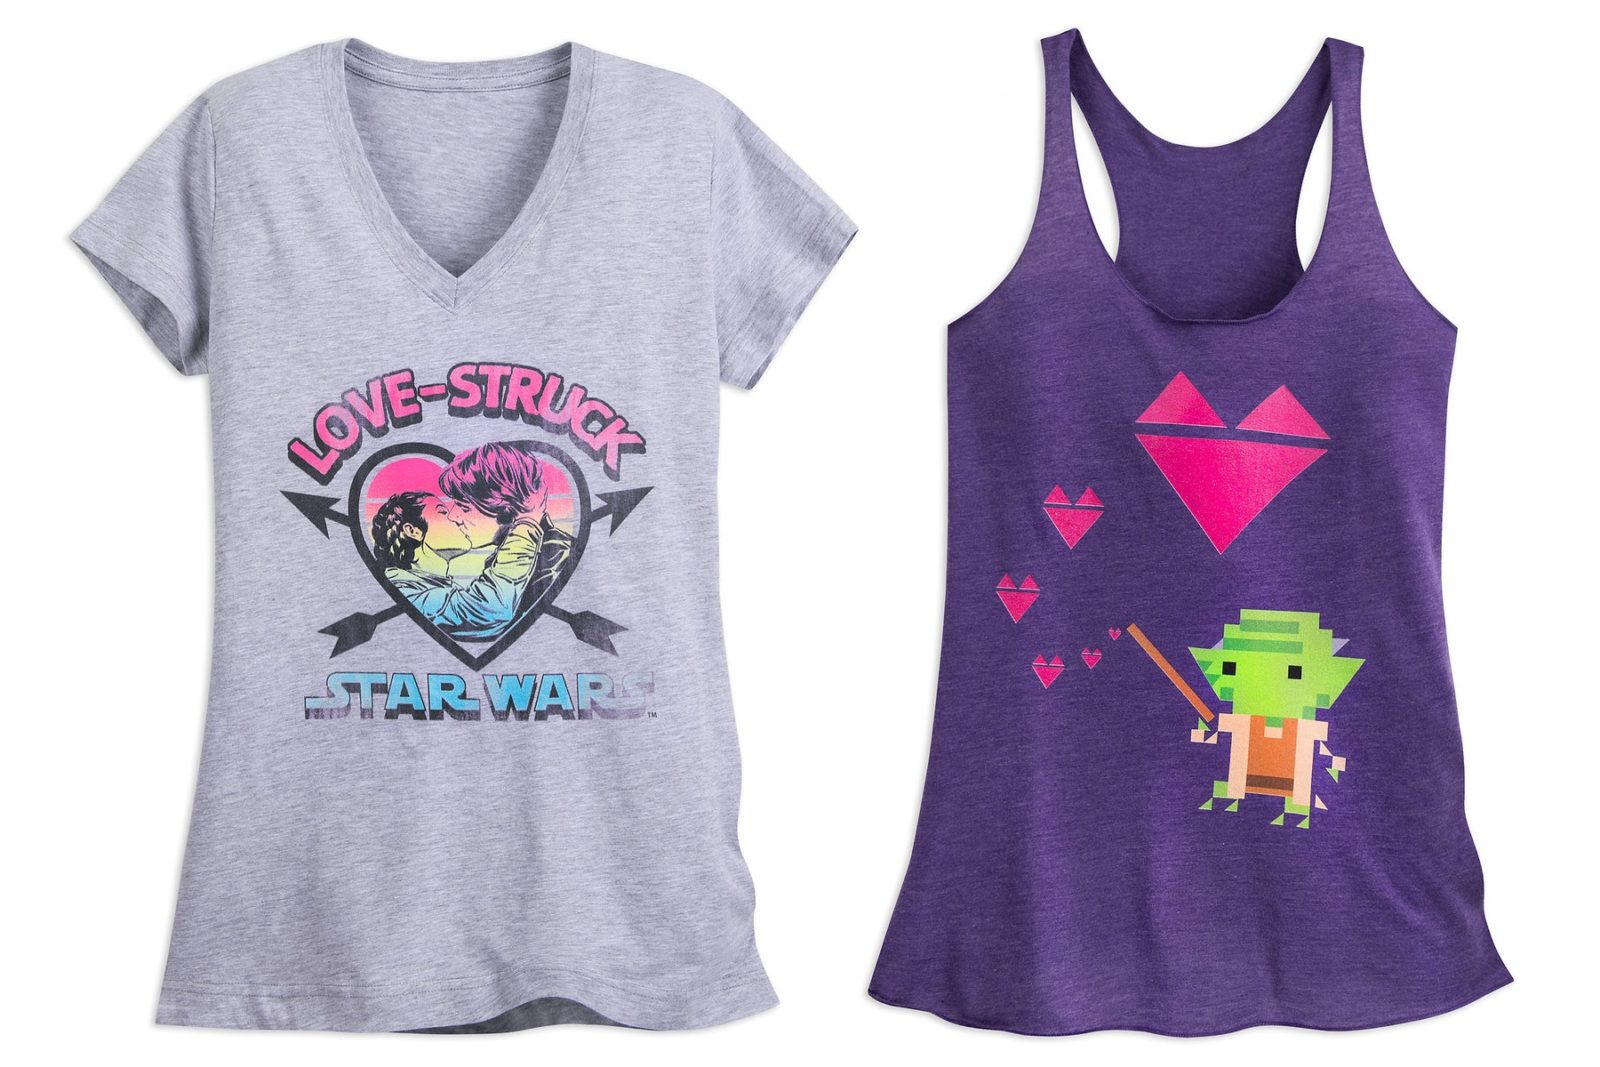 Shop Disney Star Wars Tops for Valentines Day